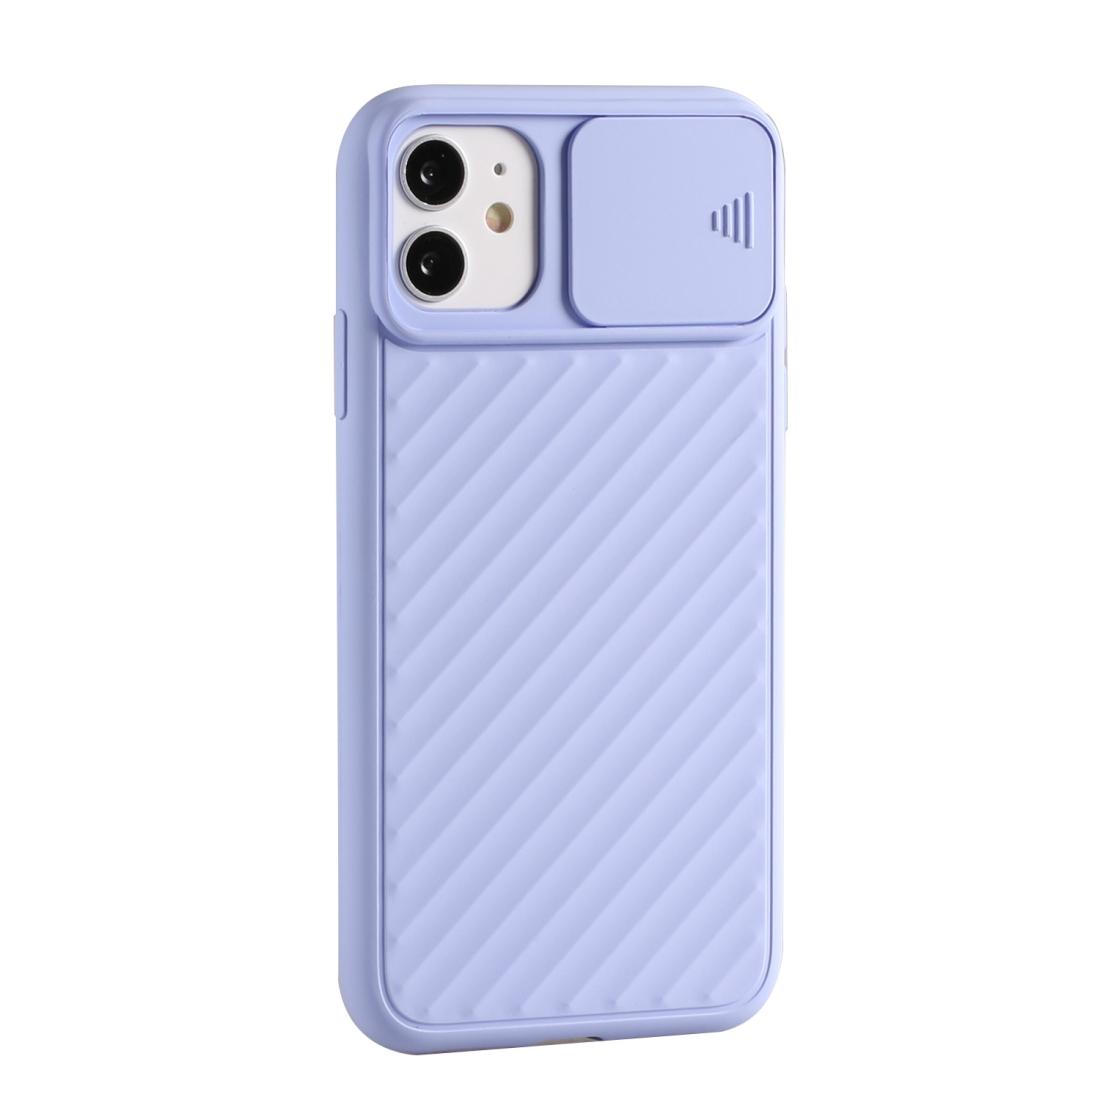 For iPhone 11 Pro Max Sliding Camera Cover Design Twill Anti-Slip TPU Case (Purple)  Alexnld.com